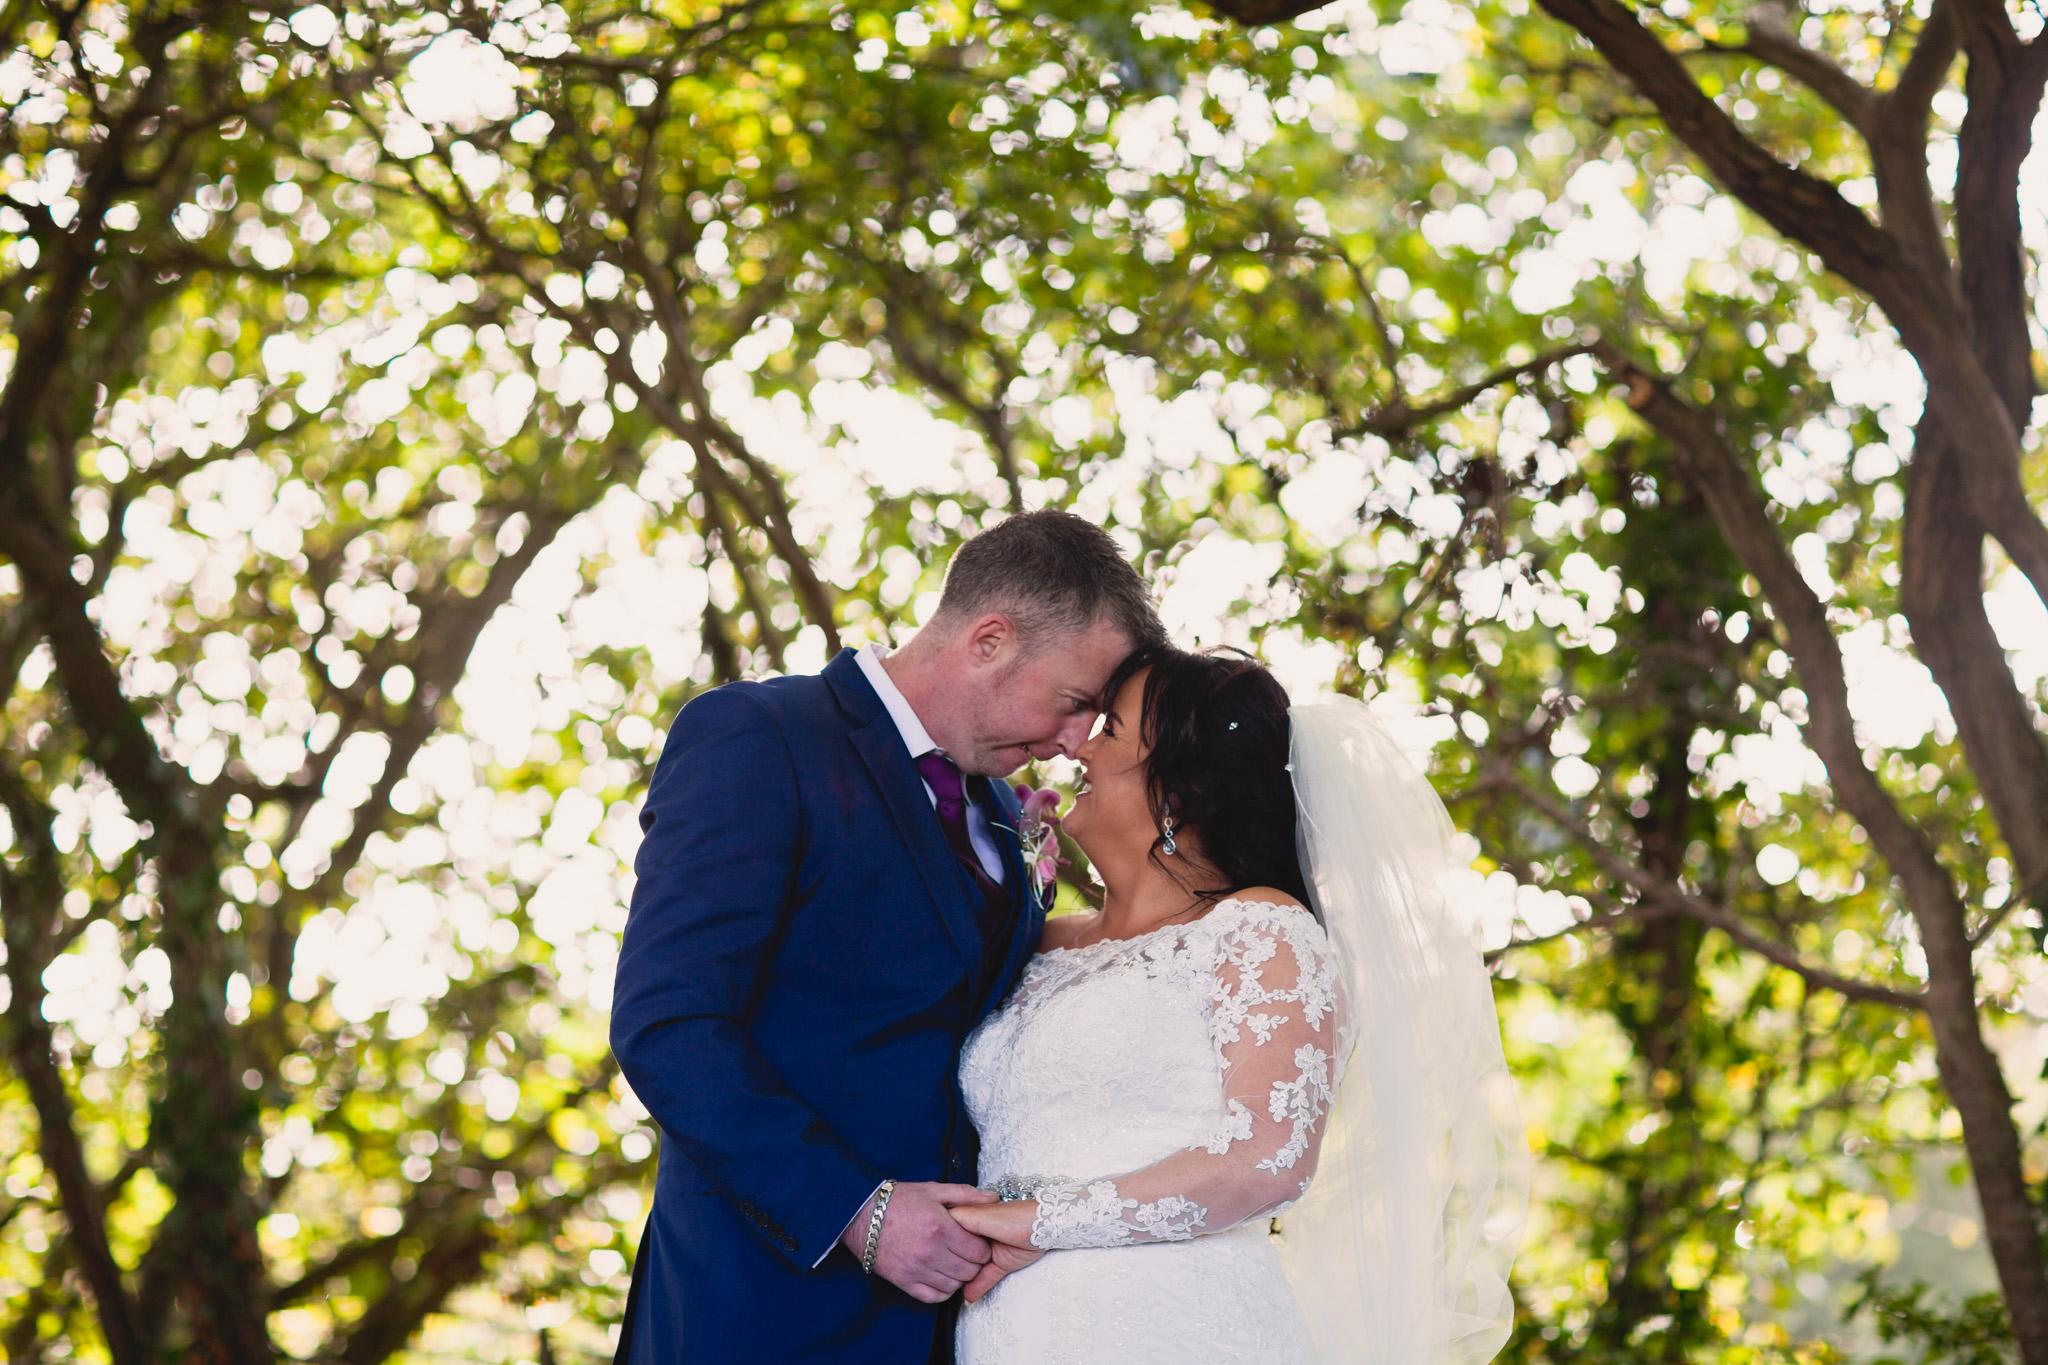 Mark_Barnes_Northern_Ireland_Wedding_Photography_Marine_hotel_ballycastle_Wedding_Photography_Janet&Darren-24.jpg